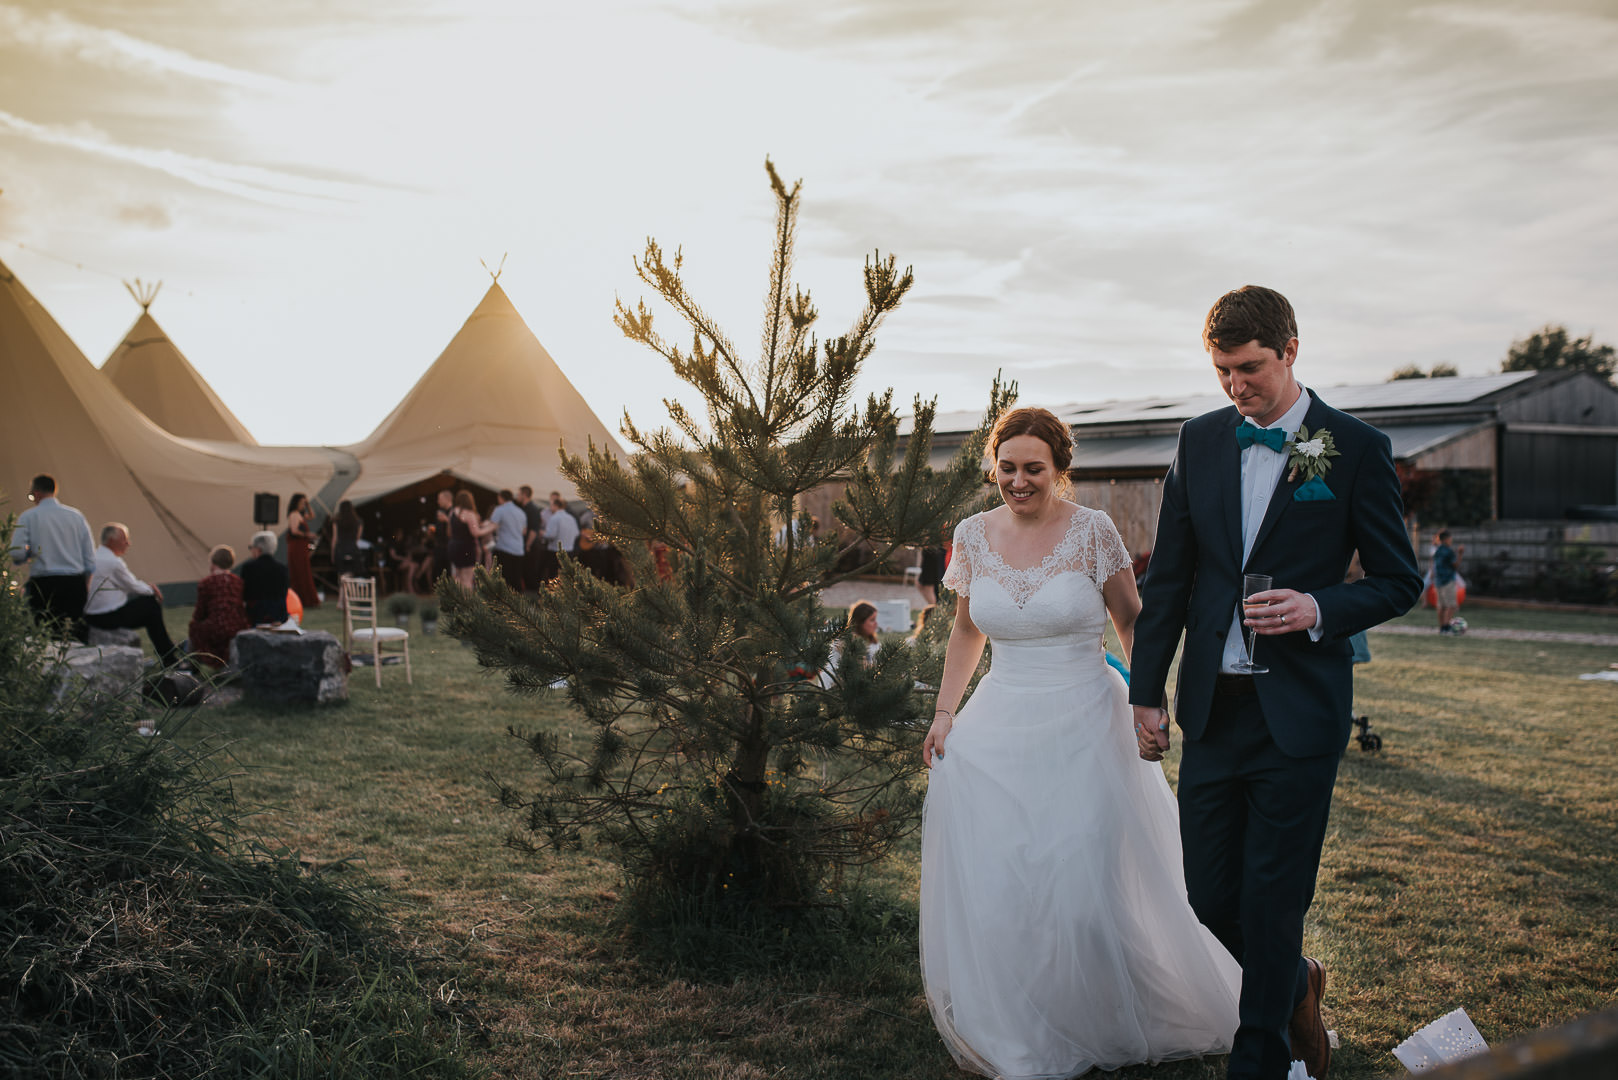 Inkersall Grange Farm wedding